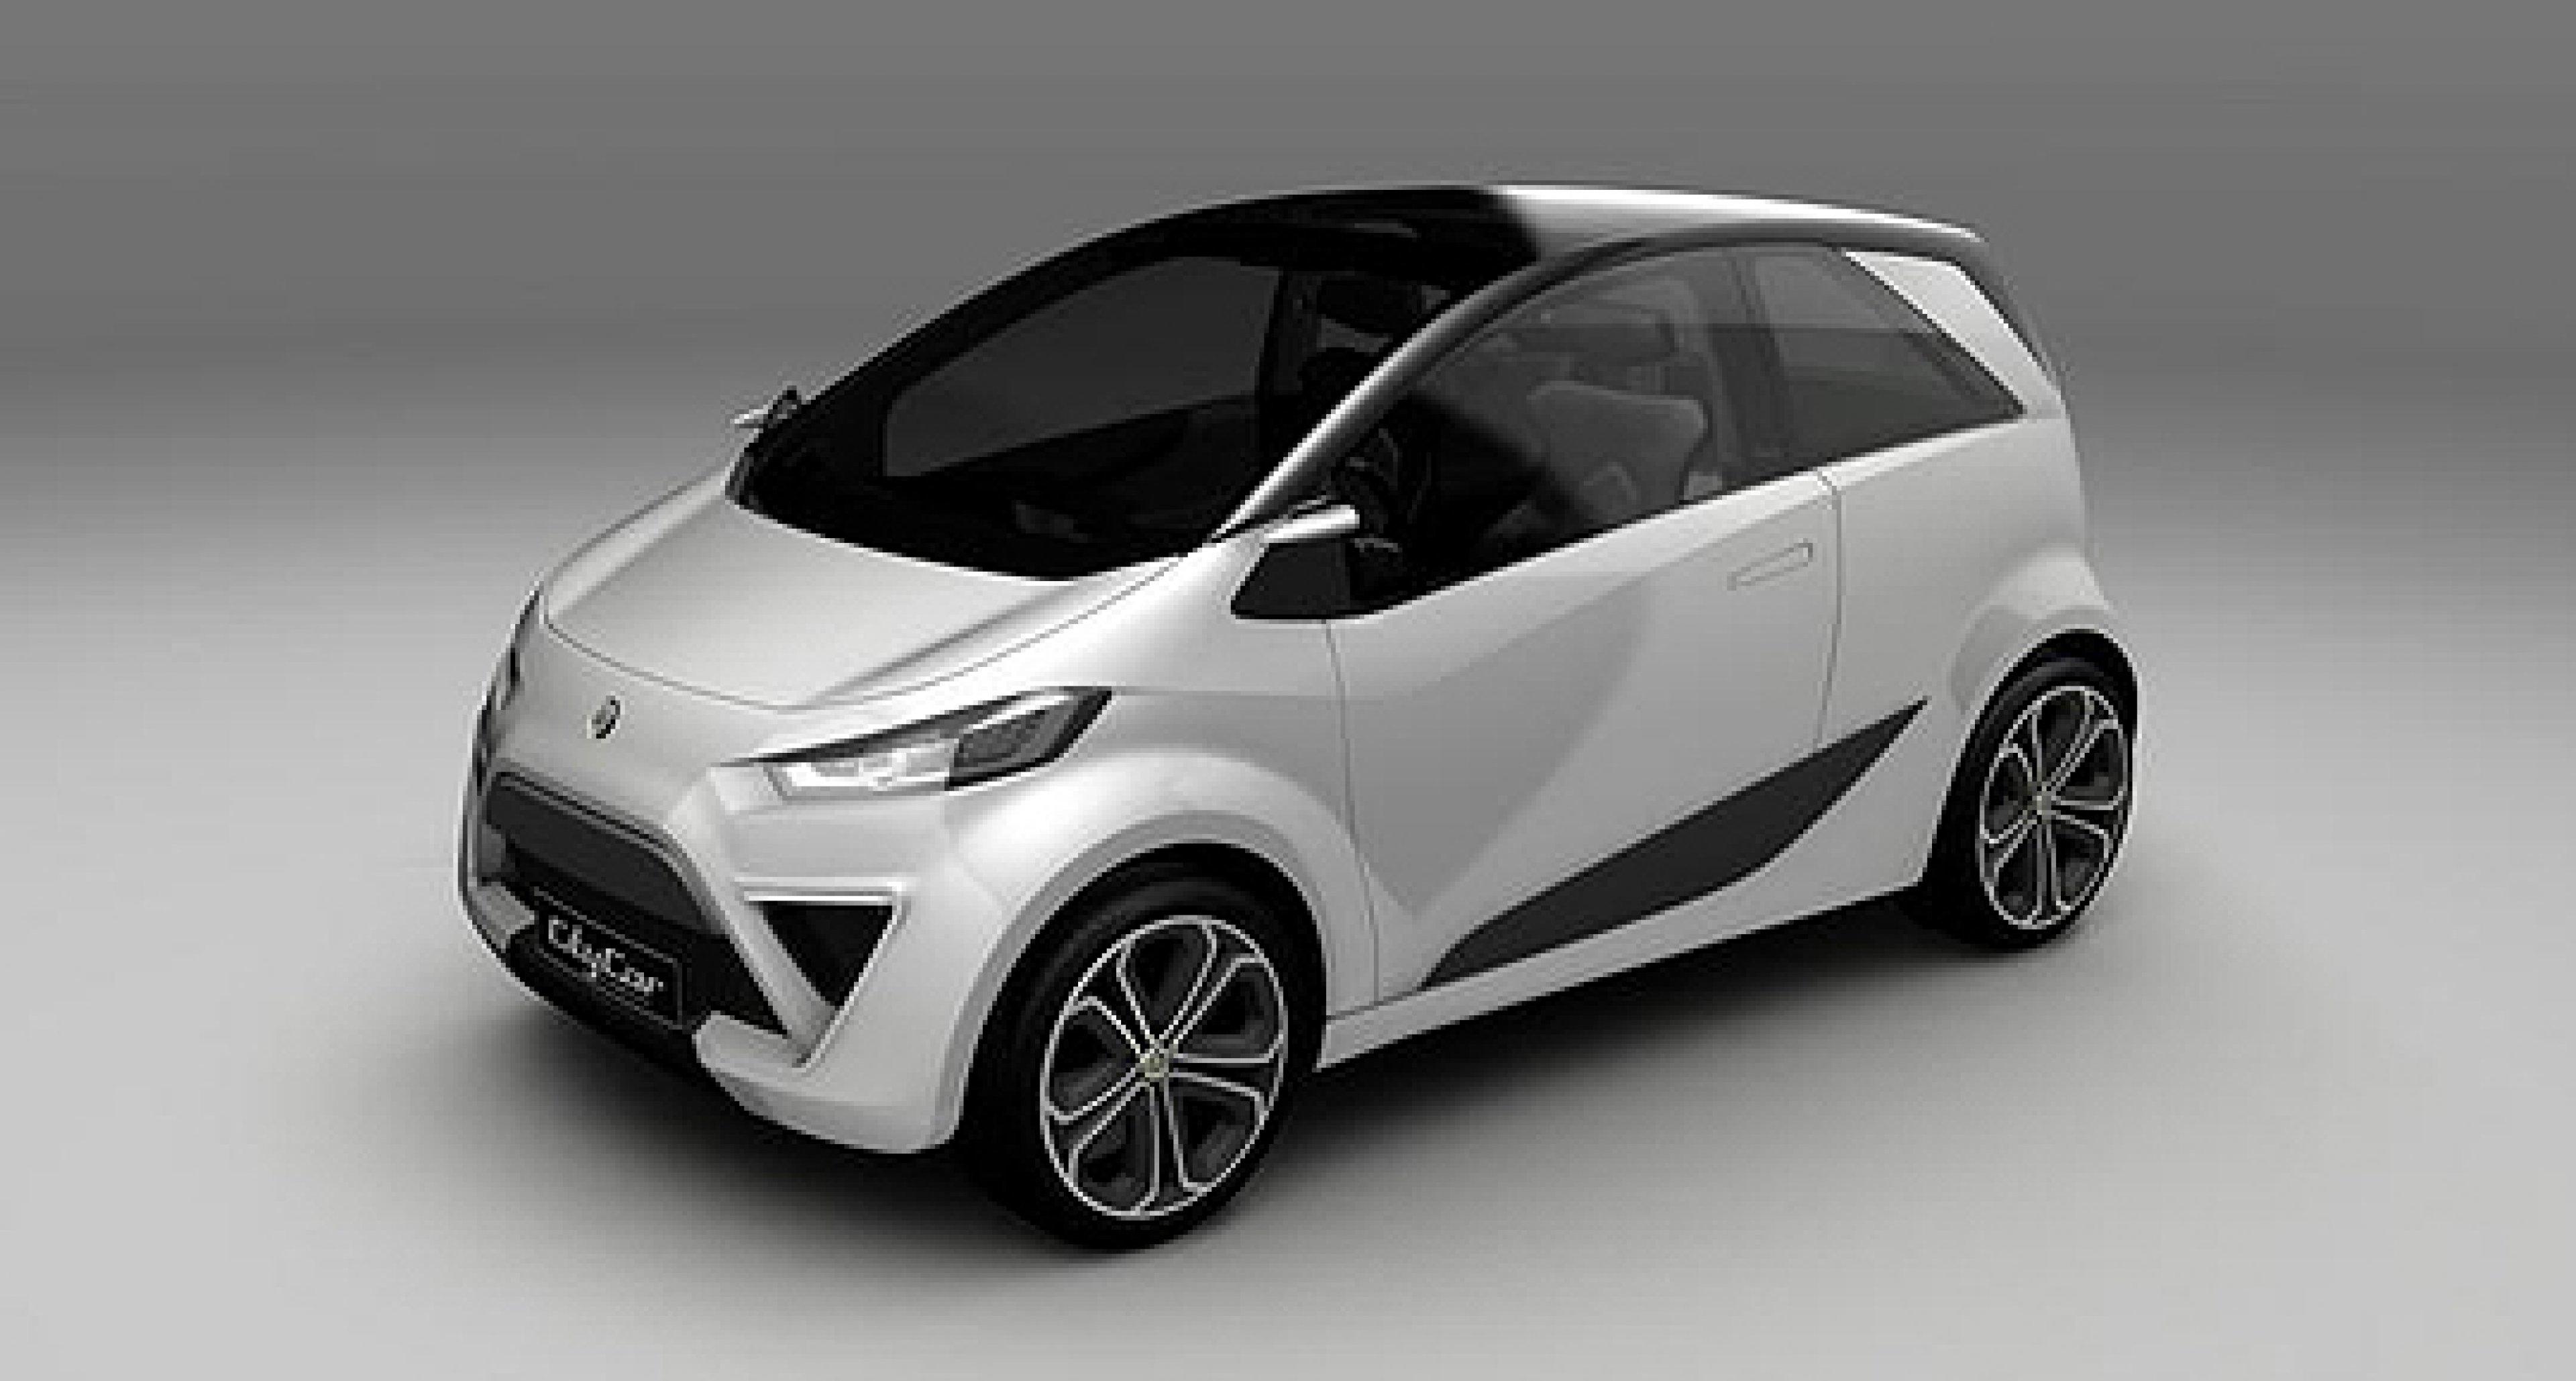 Lotus City Car für 2013 bestätigt